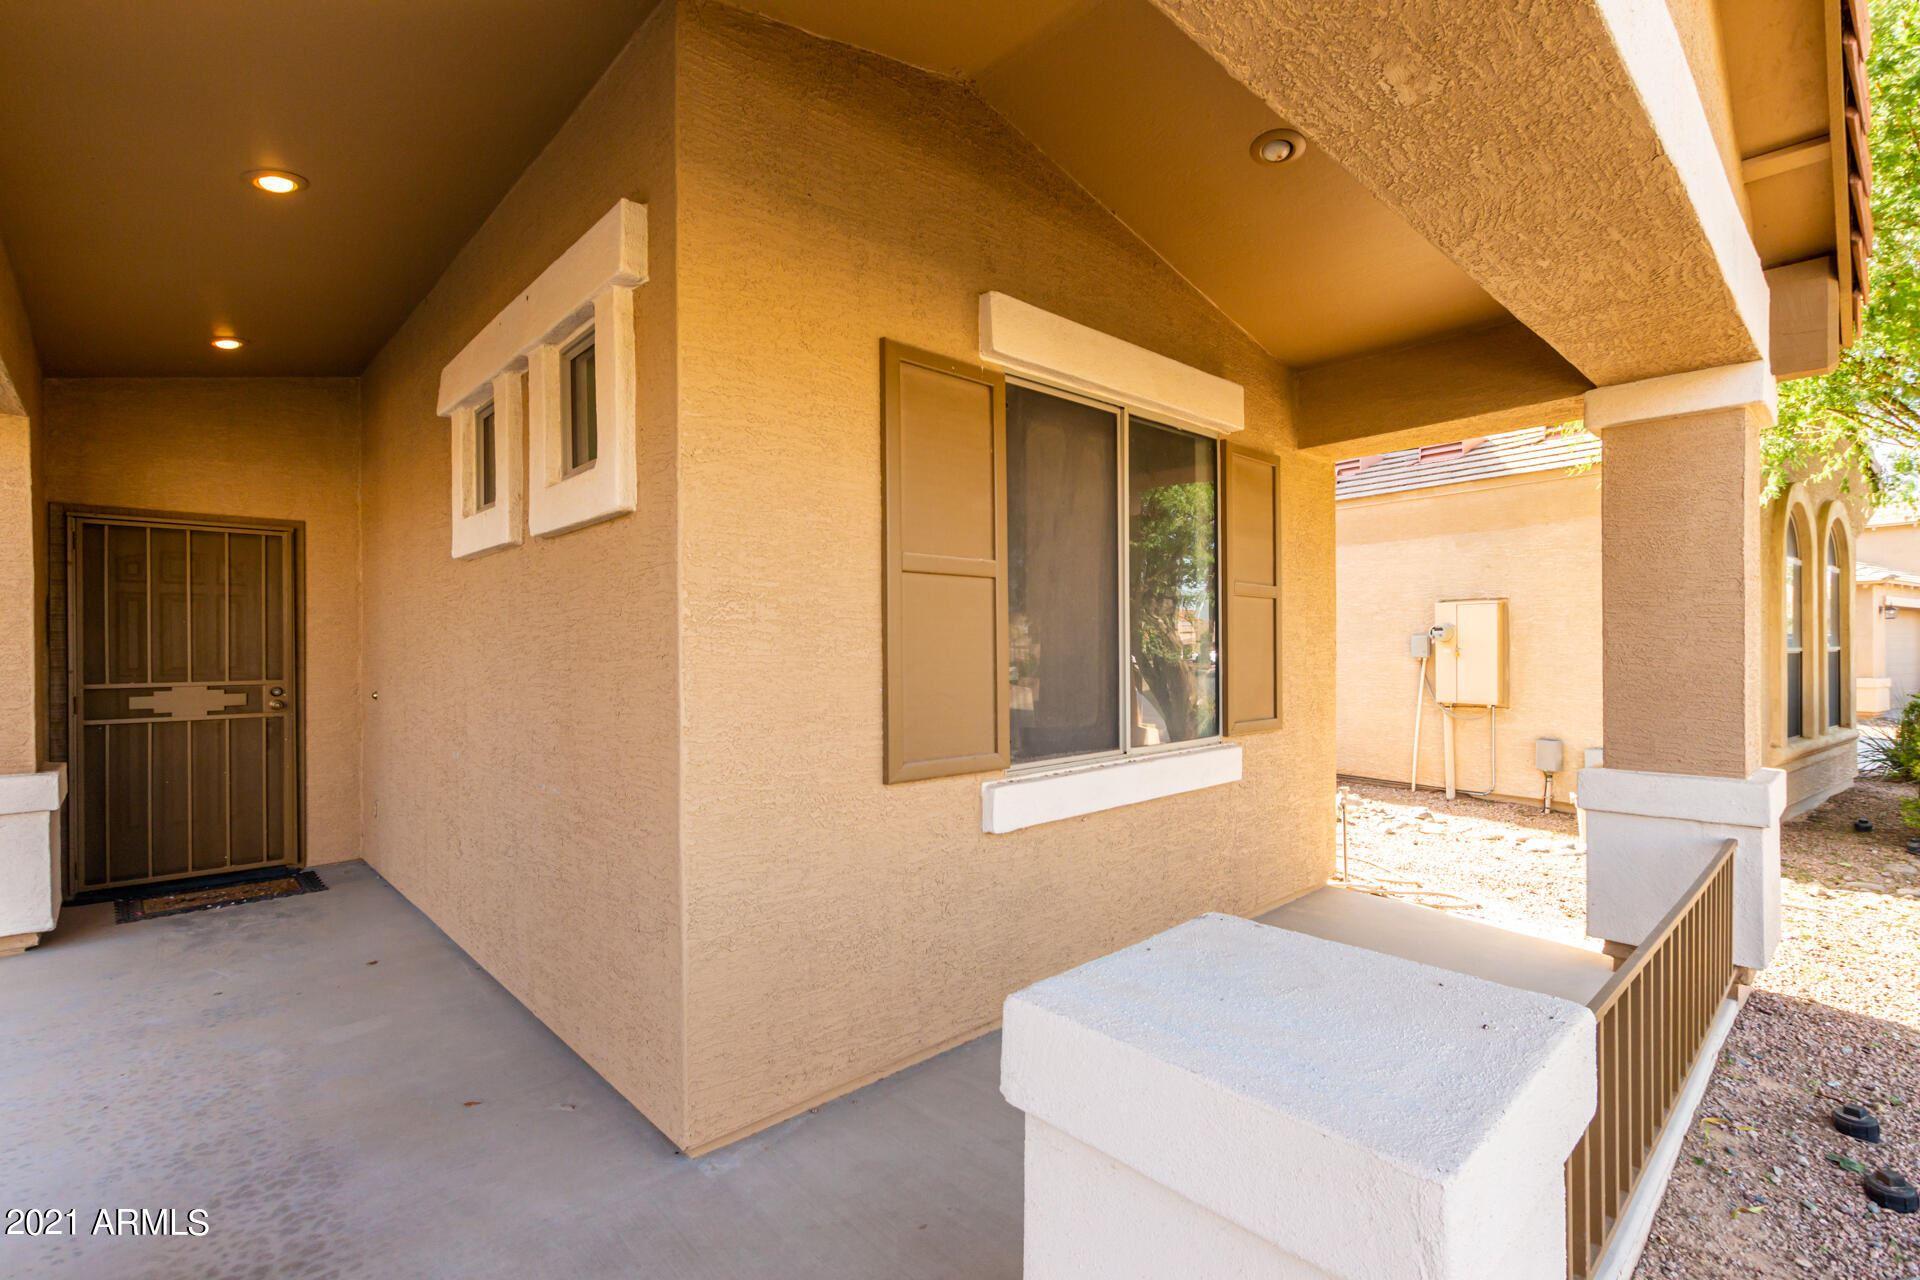 Photo of 22468 N VANDERVEEN Way, Maricopa, AZ 85138 (MLS # 6306780)